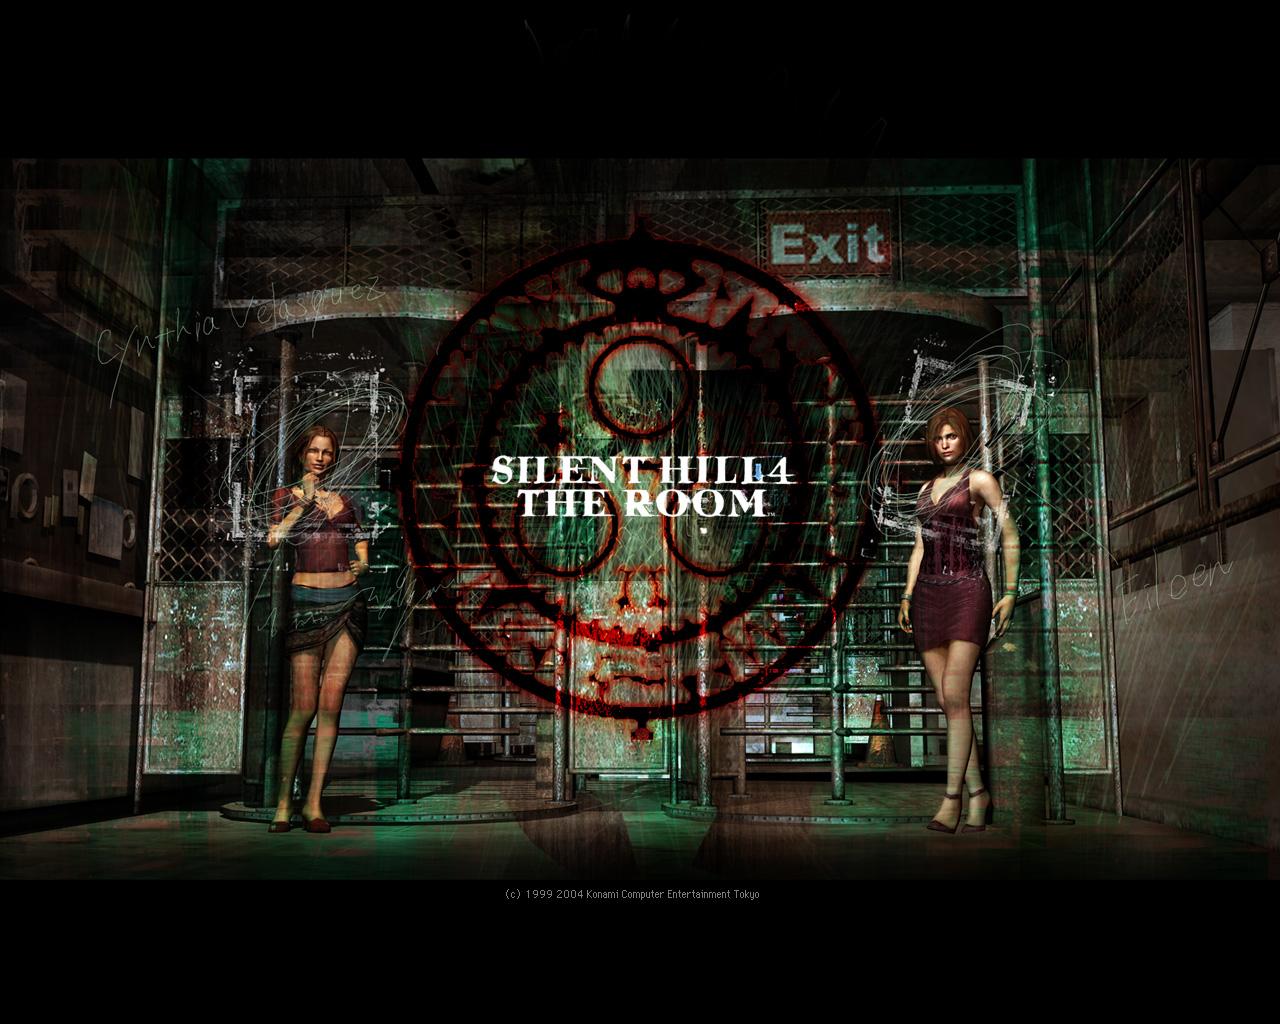 Silent Hill 4 Wallpaper Hd 1280x1024 Wallpaper Teahub Io